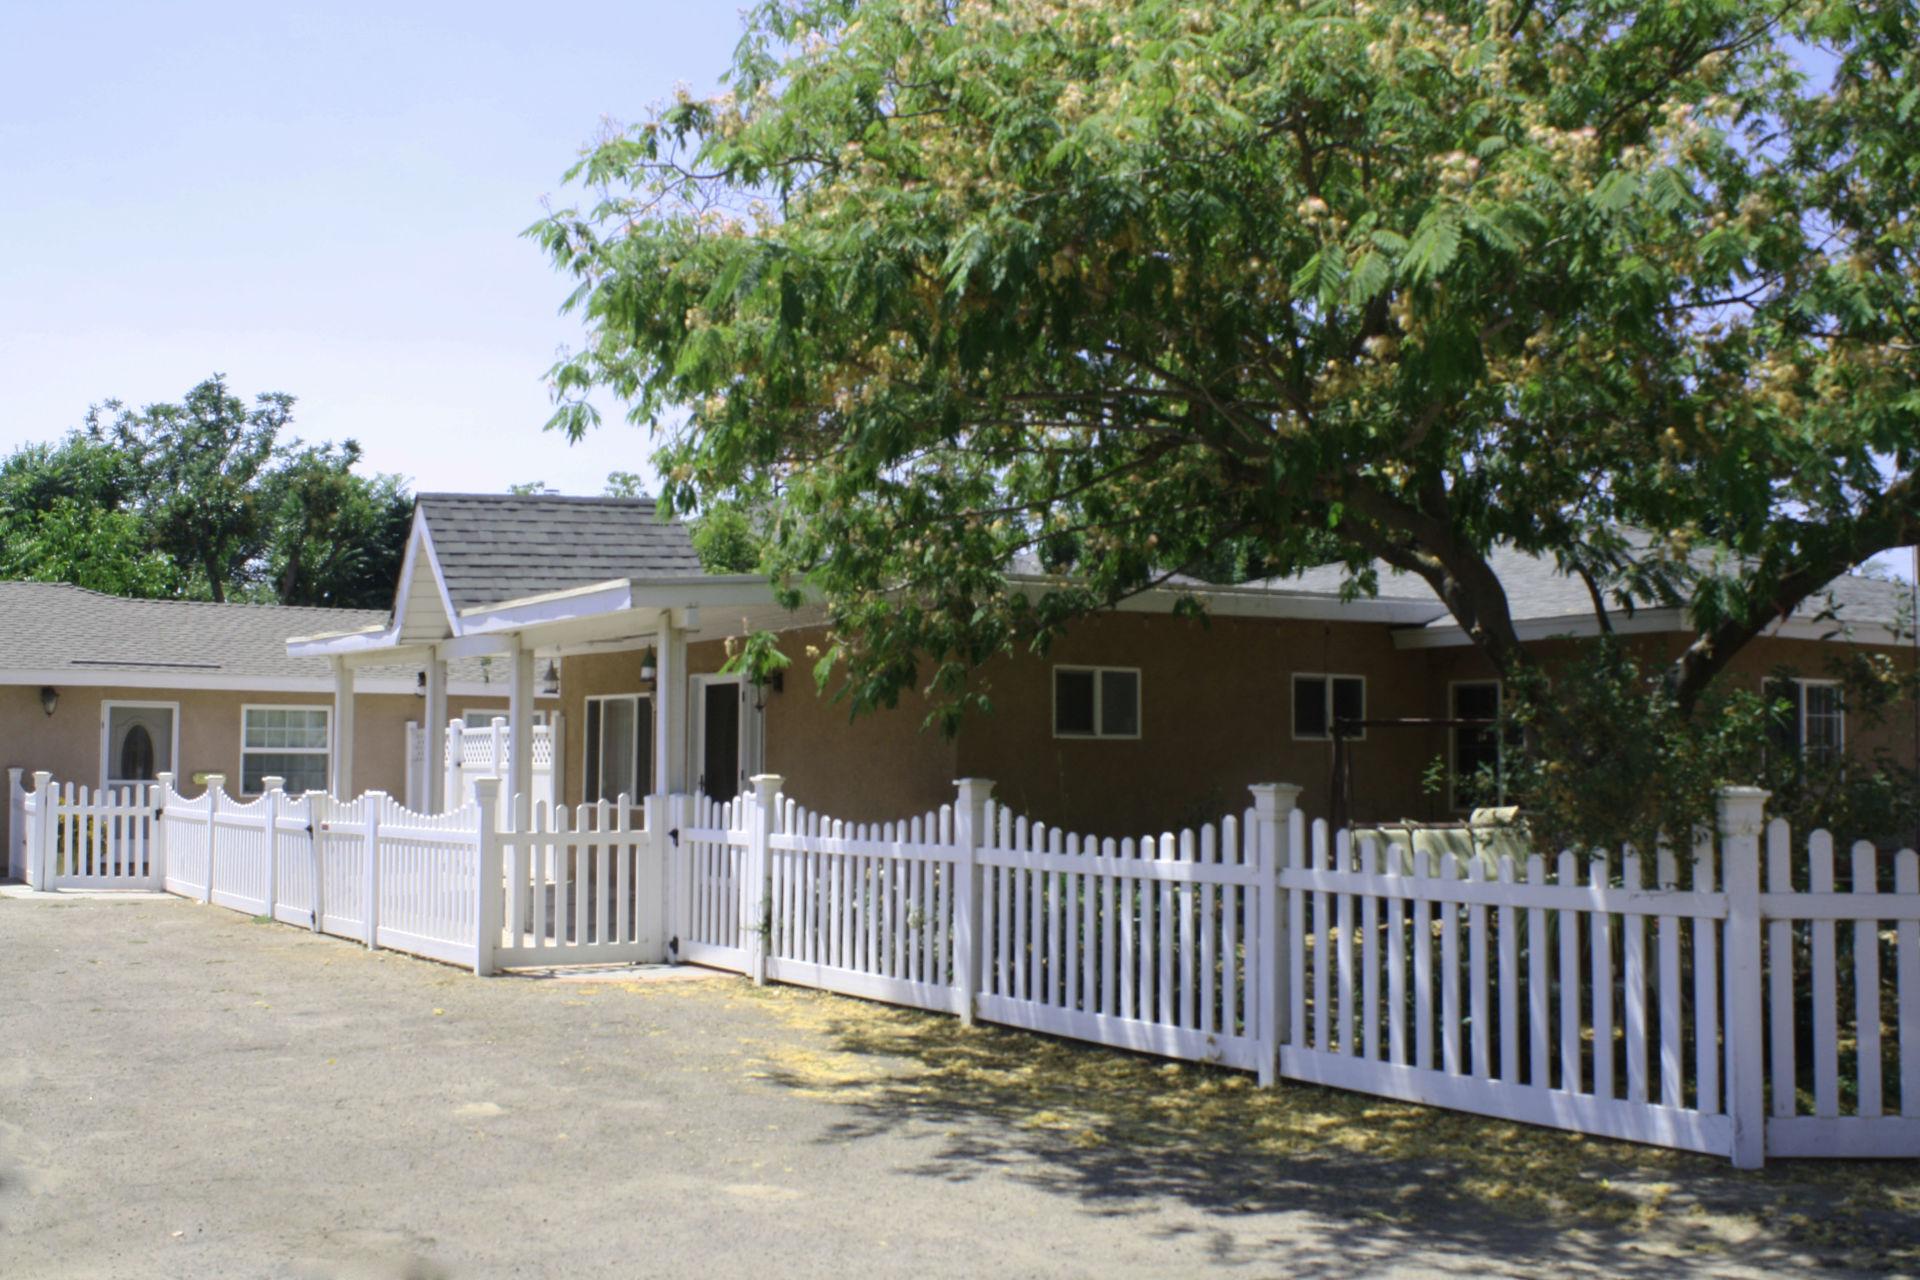 4576 Adam Rd Simi Valley –  New Listing by Anissa Orsini